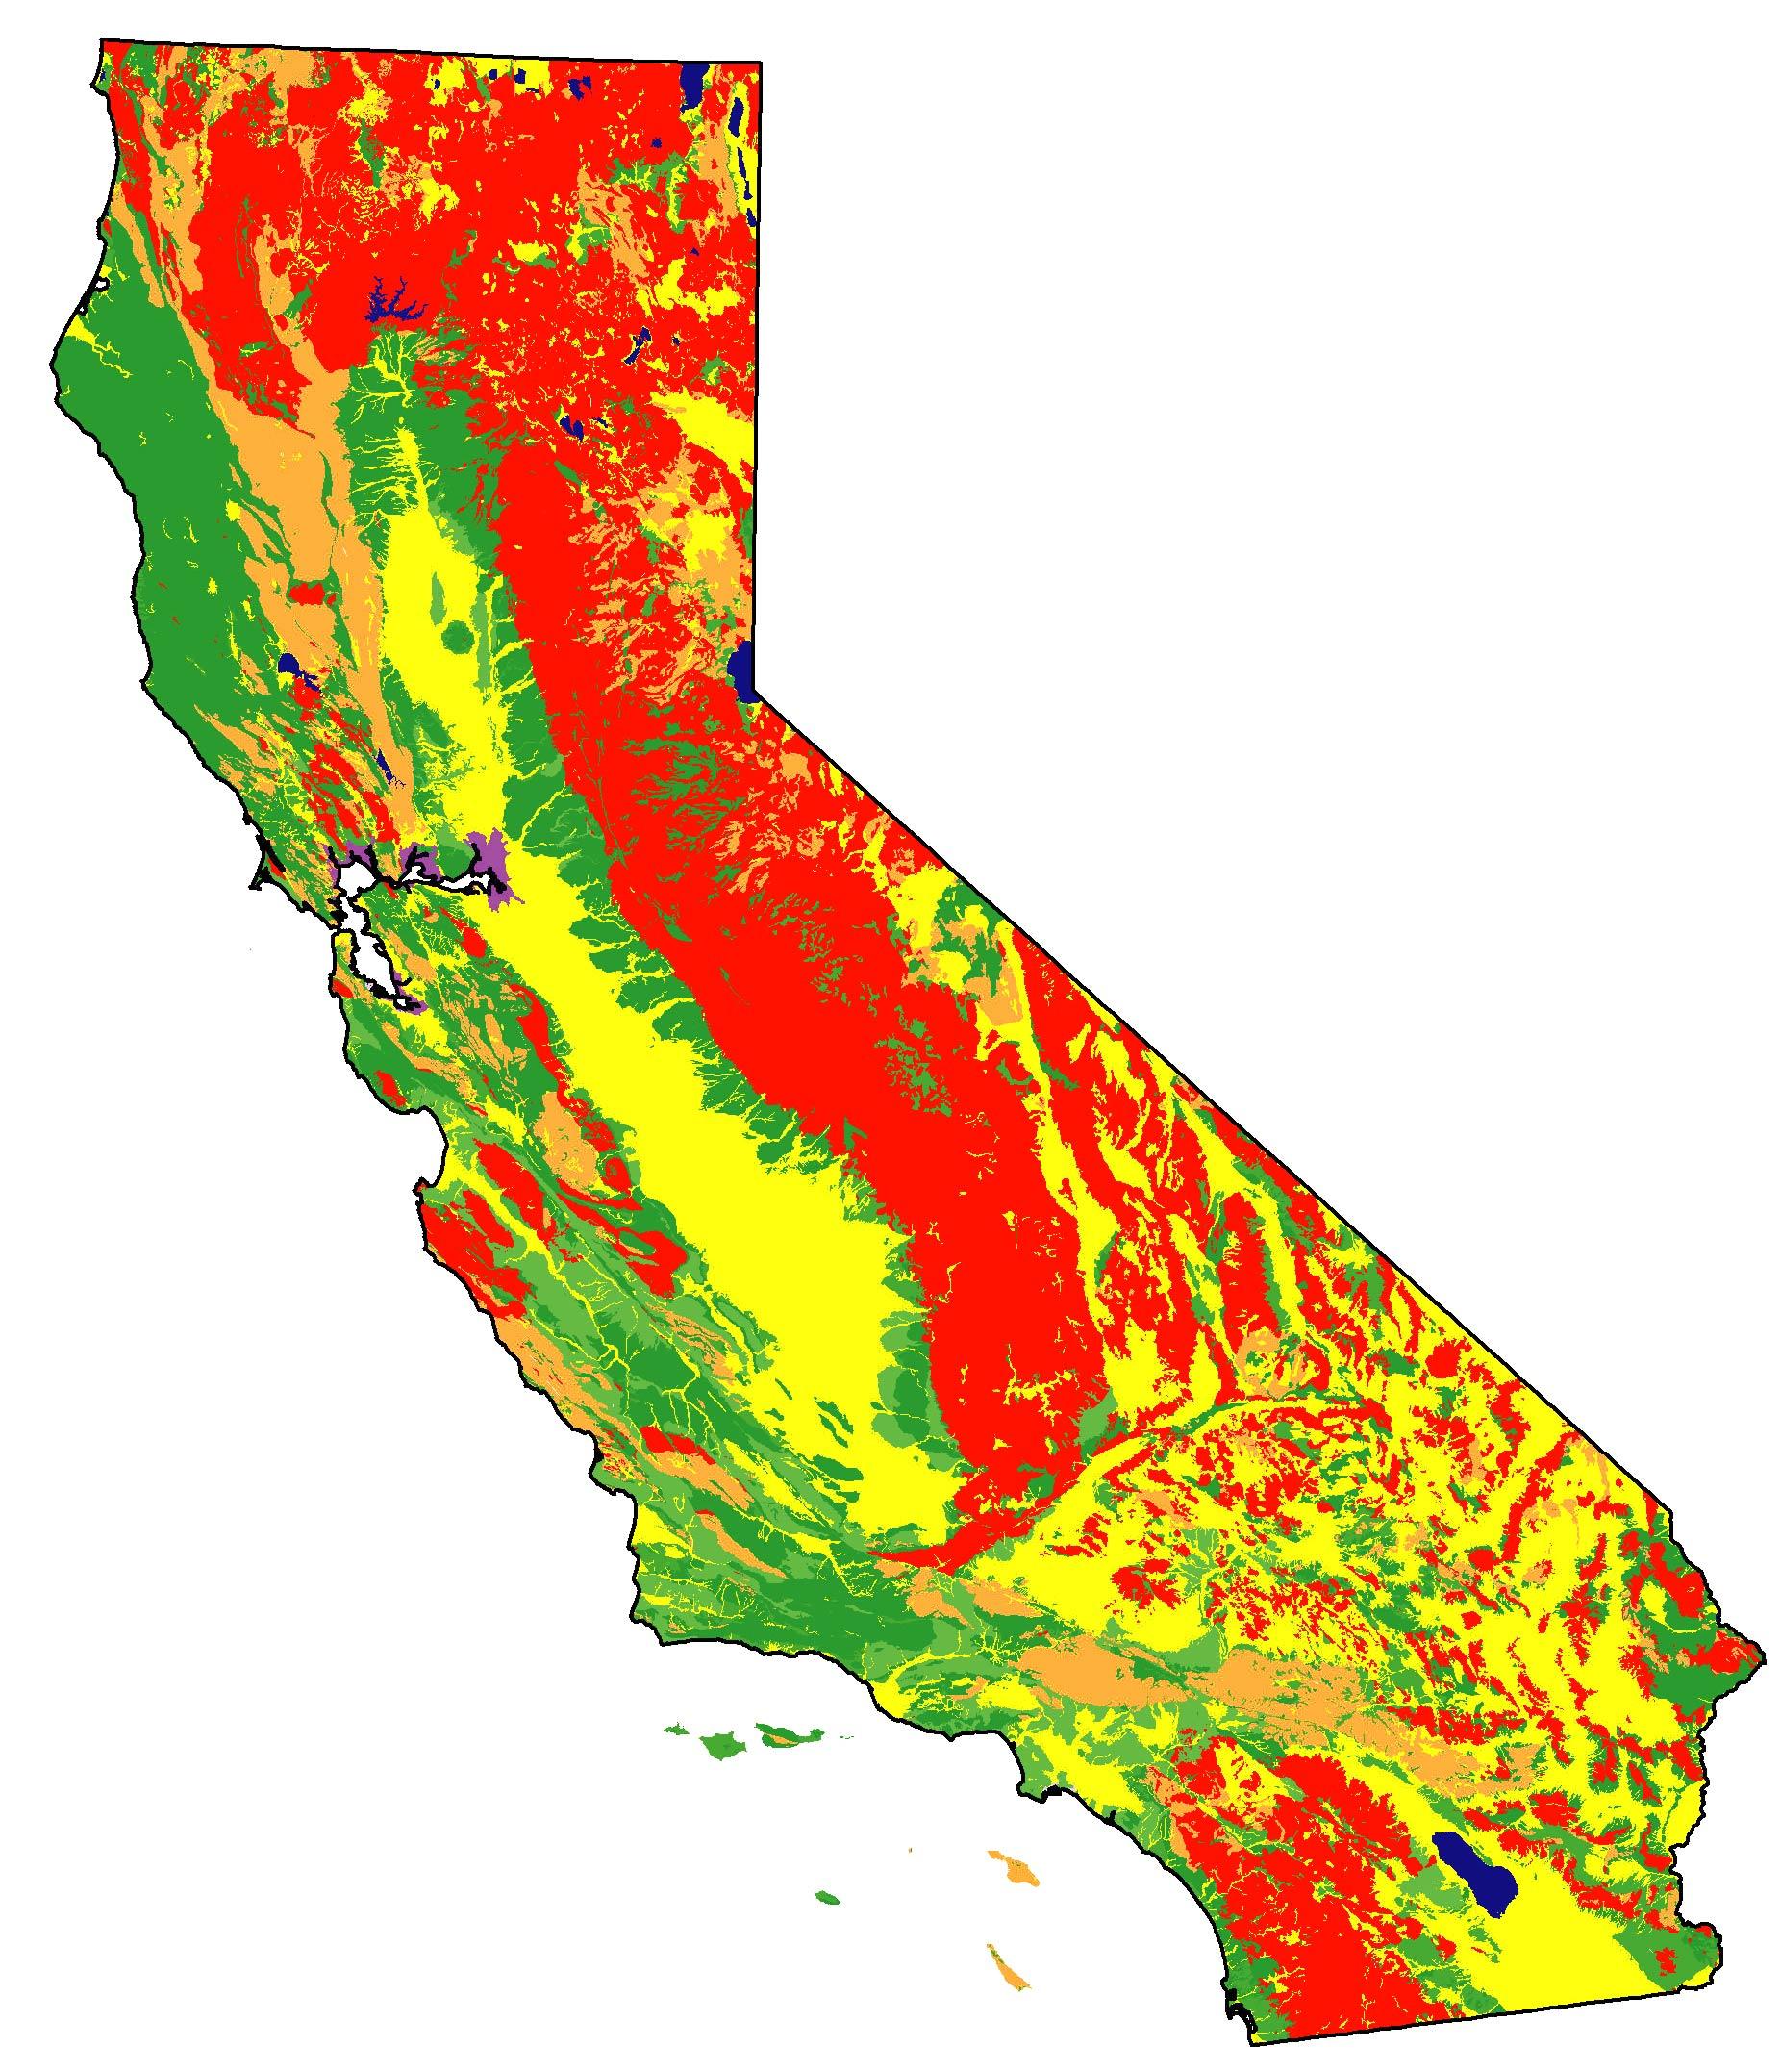 Soils Maps With Road California Earthquake Hazard Map - Klipy - California Soil Map